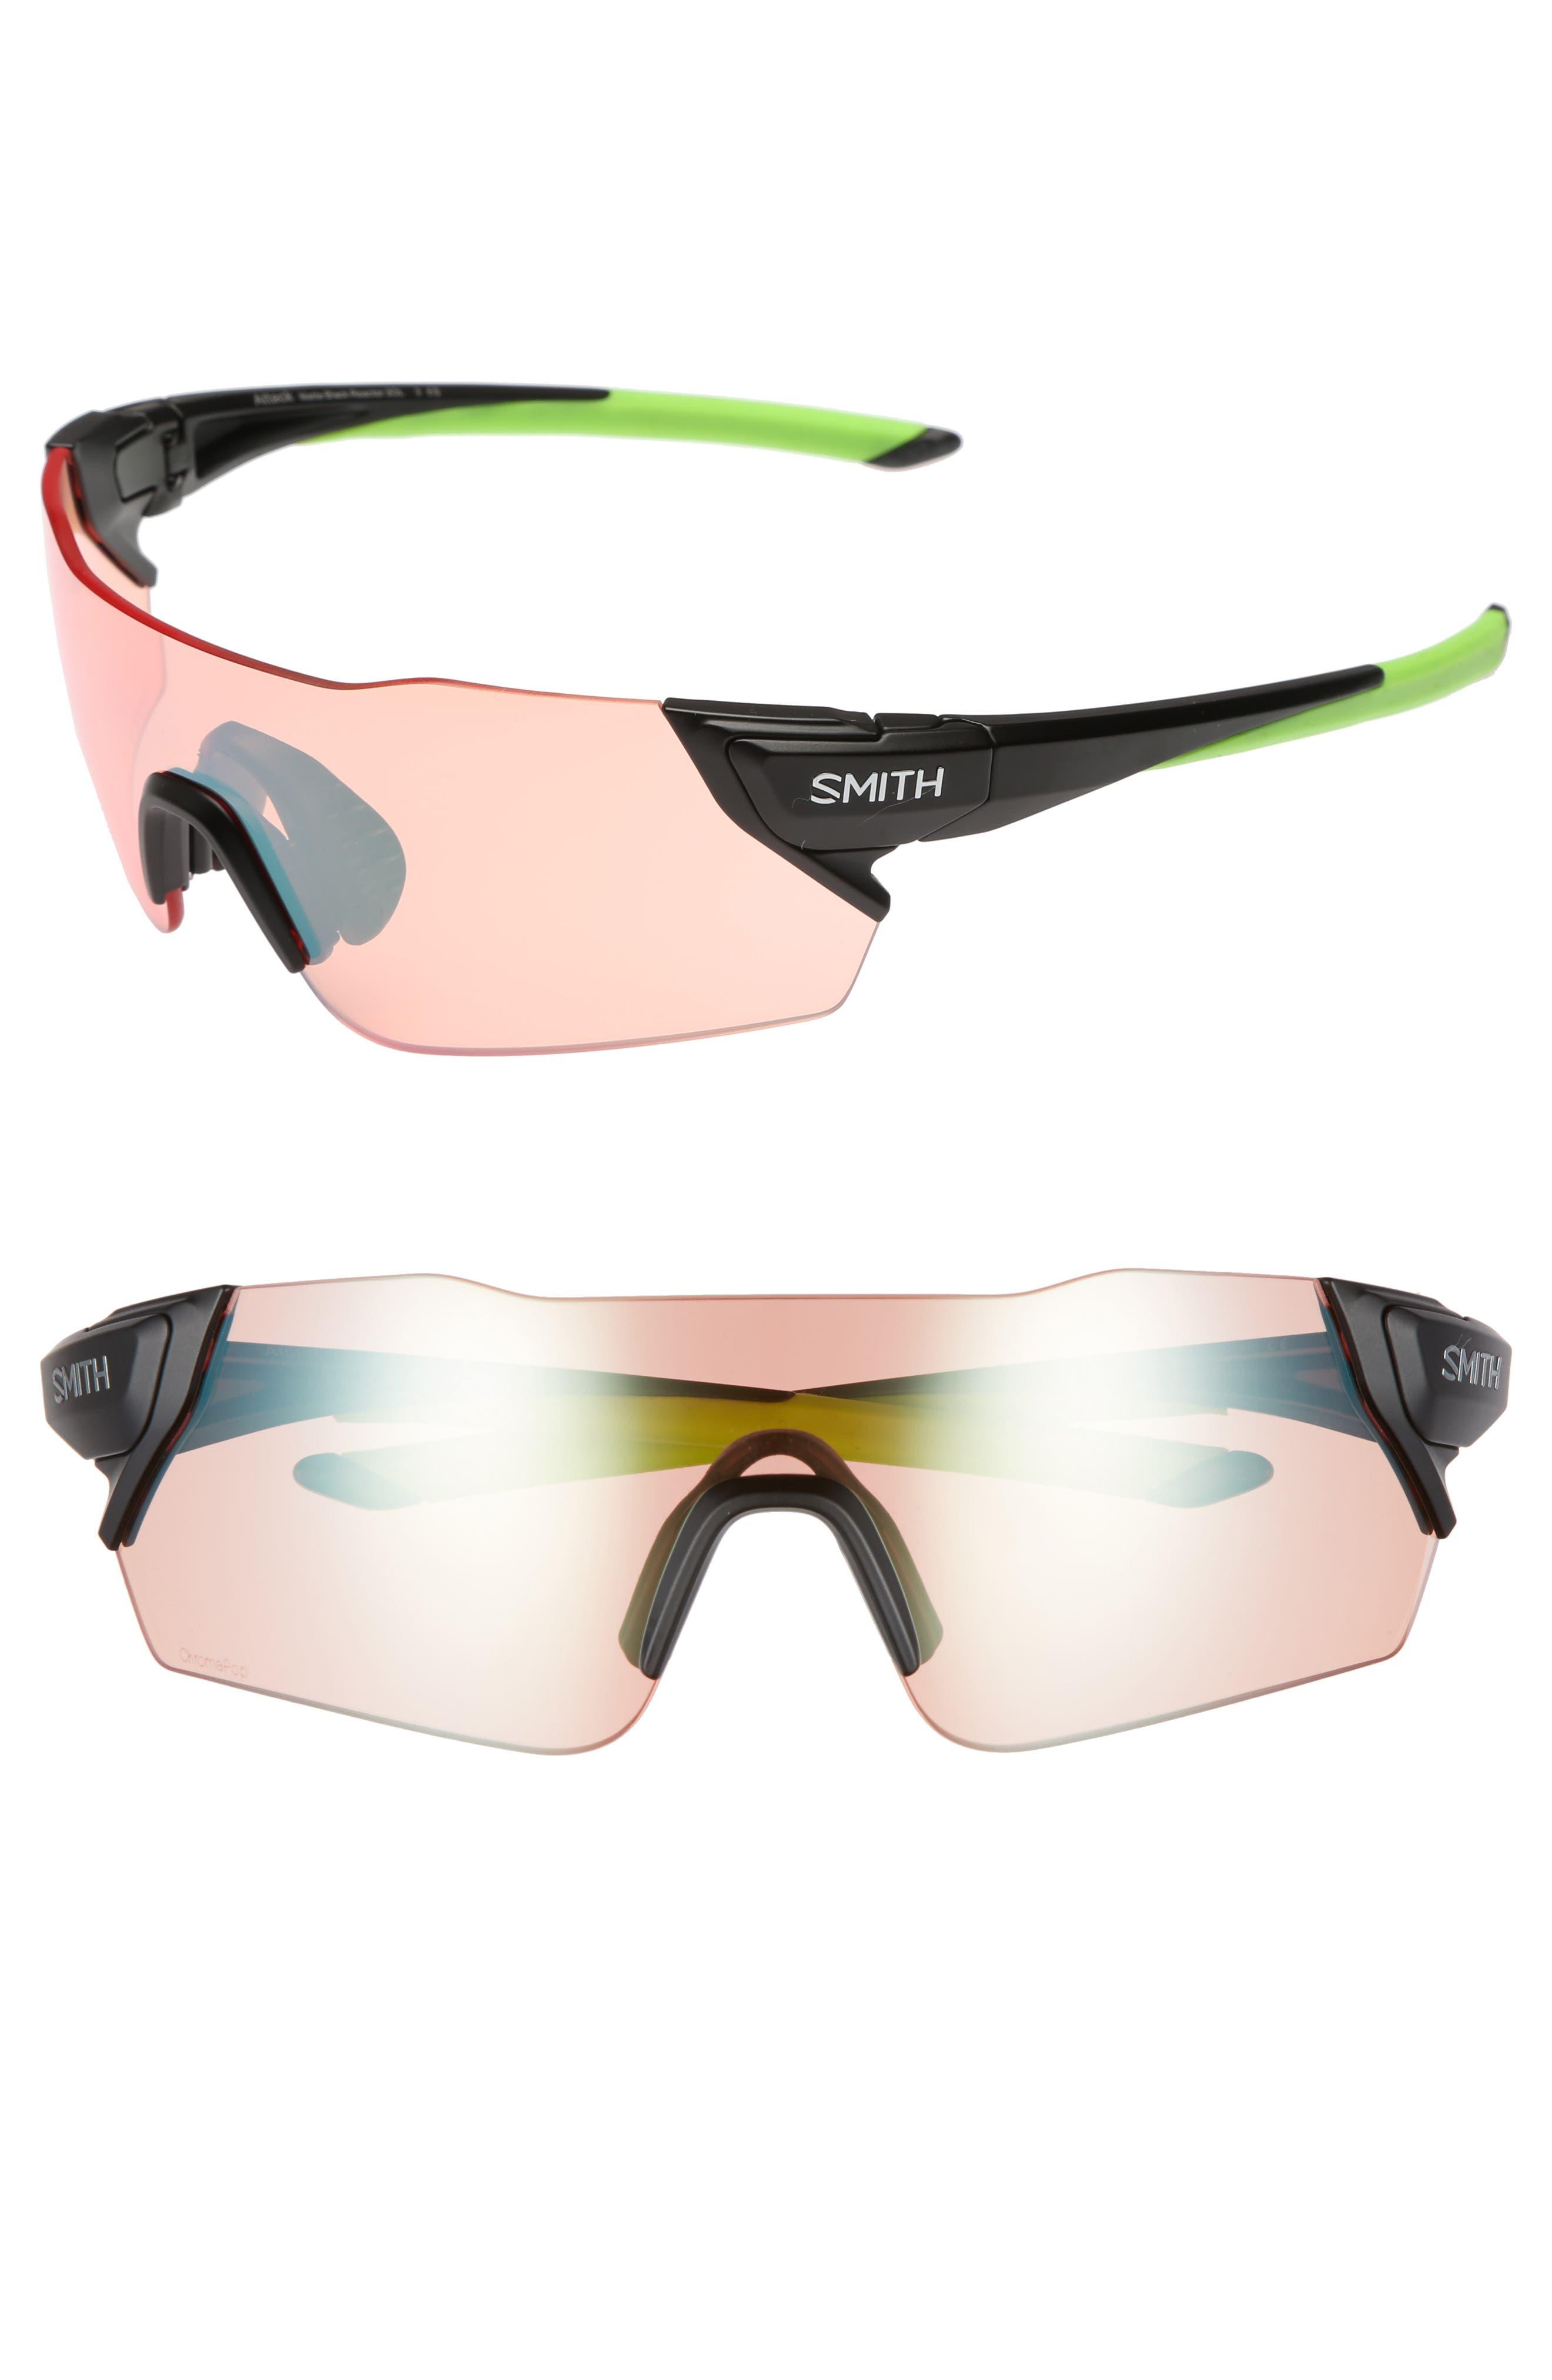 Smith Attack 125mm ChromaPop™ Polarized Shield Sunglasses